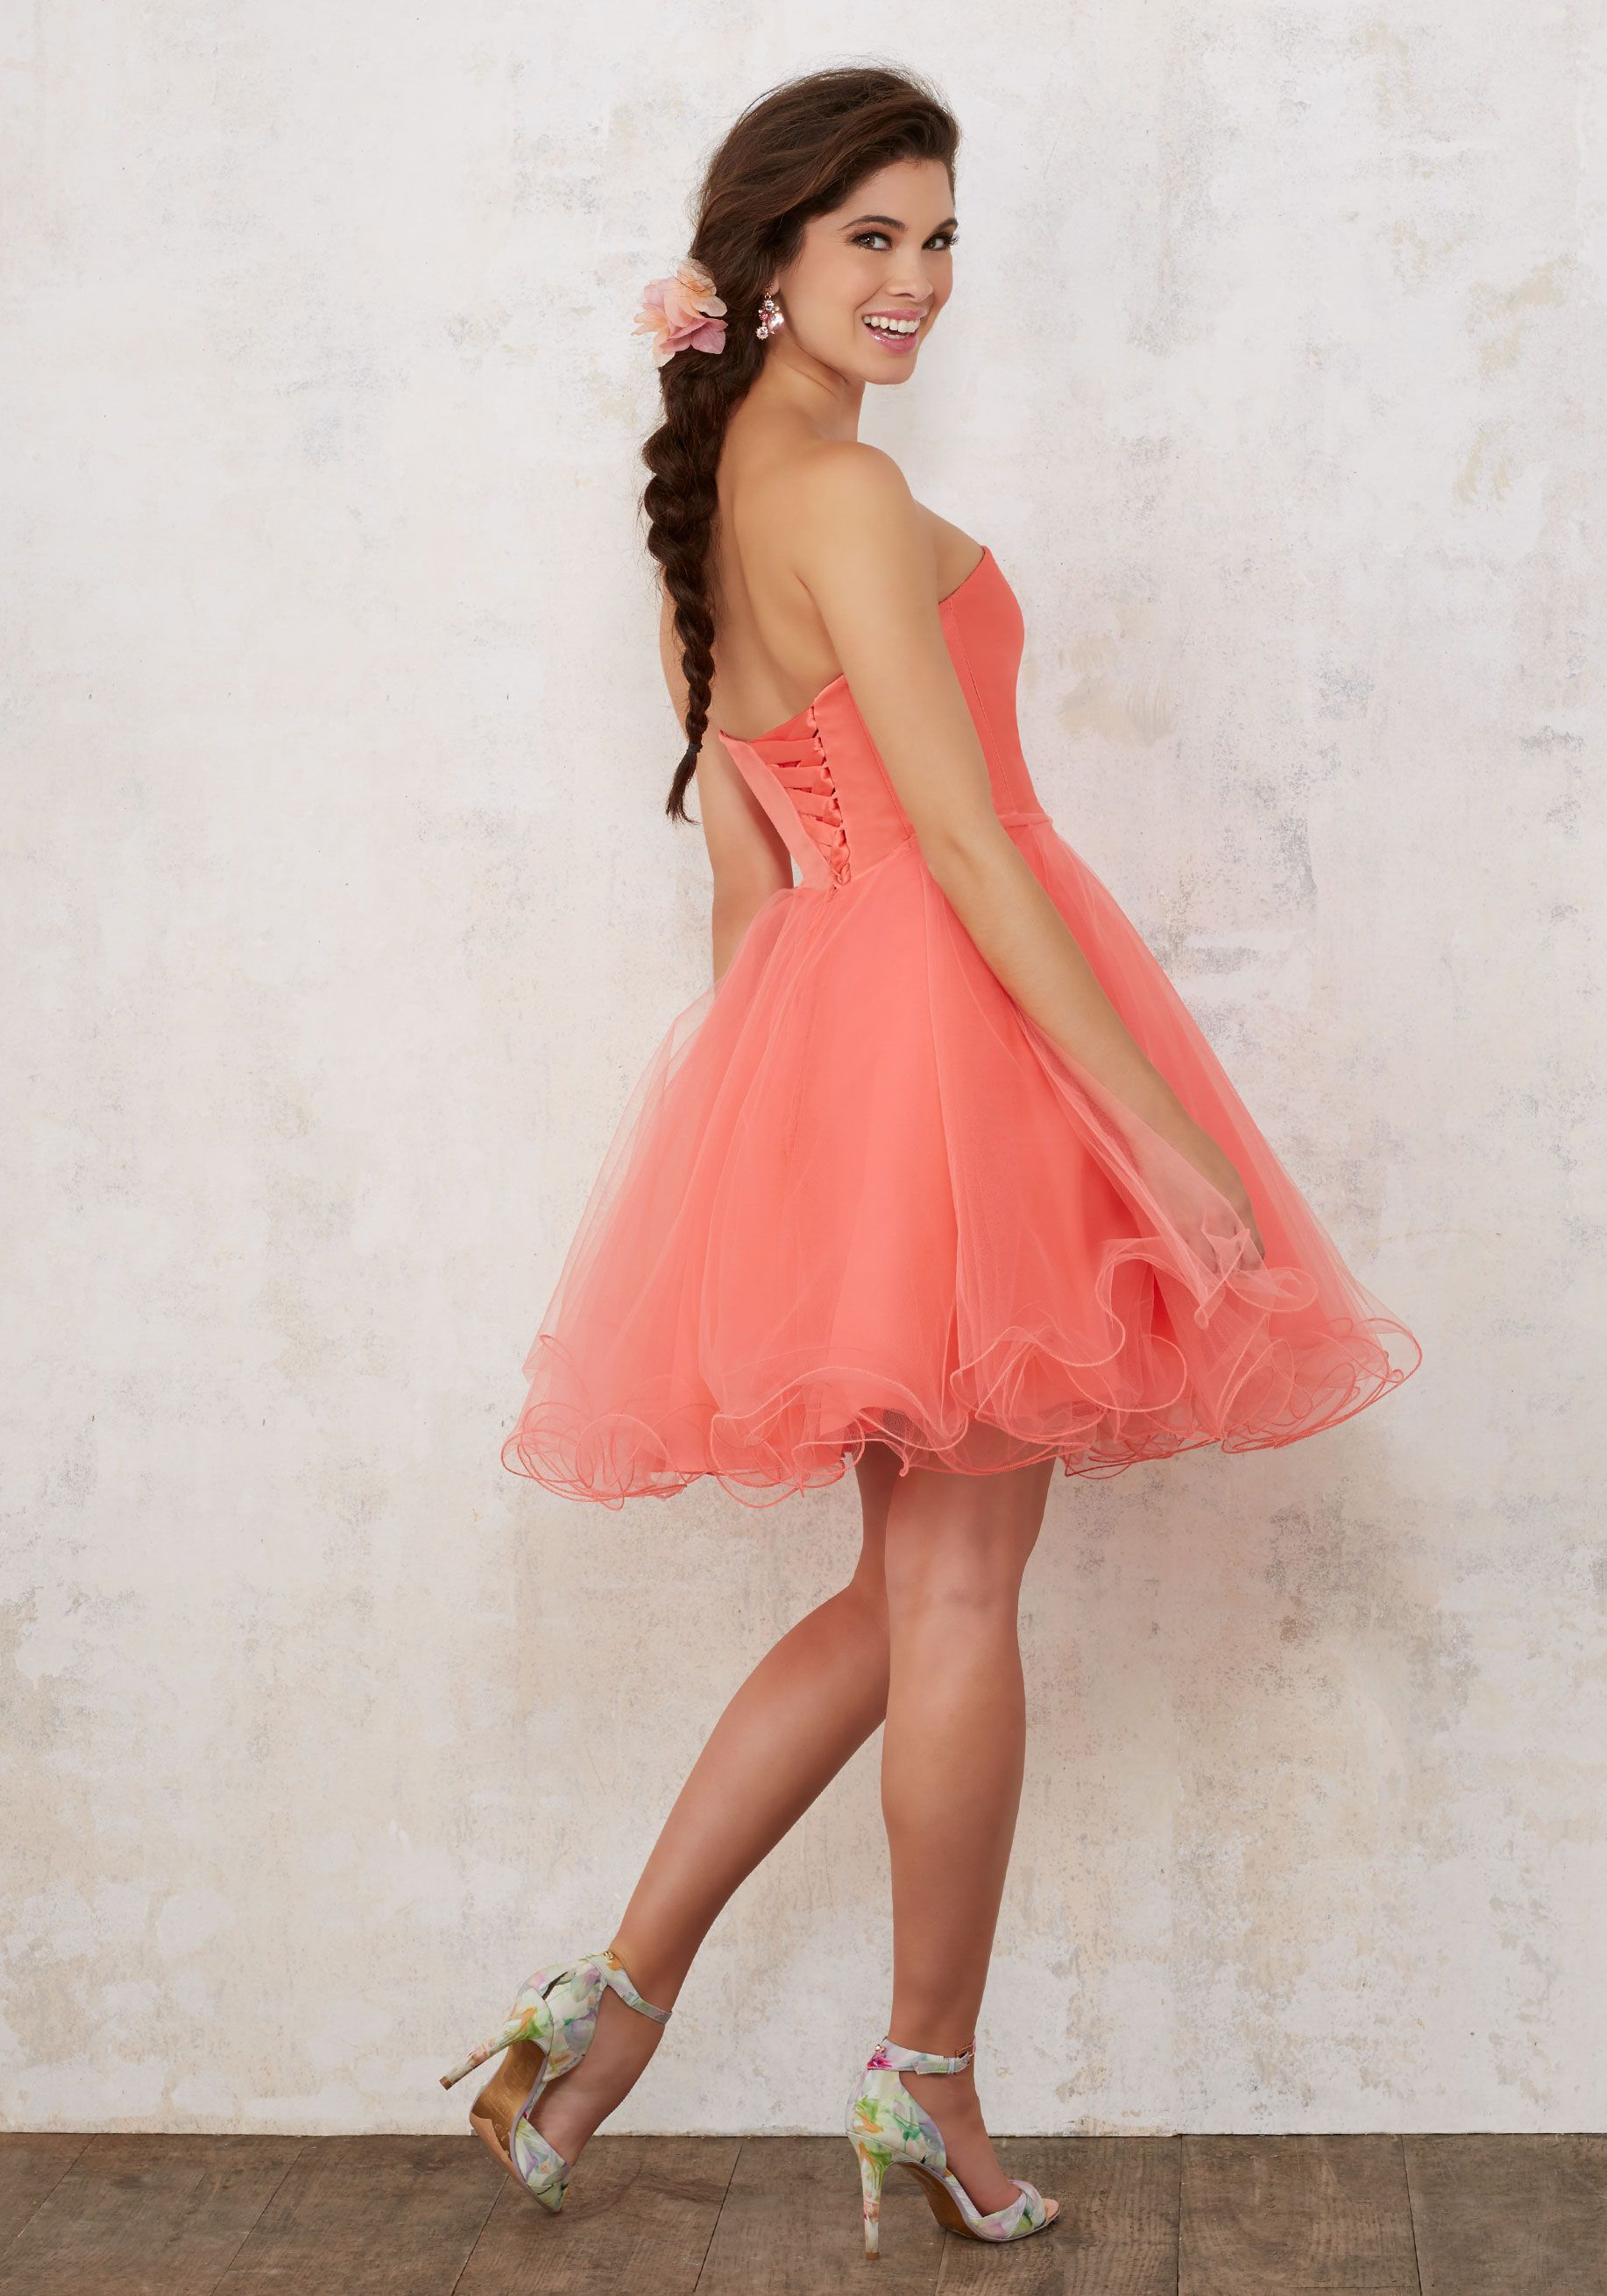 Satin and tulle damas dress with beading damas style